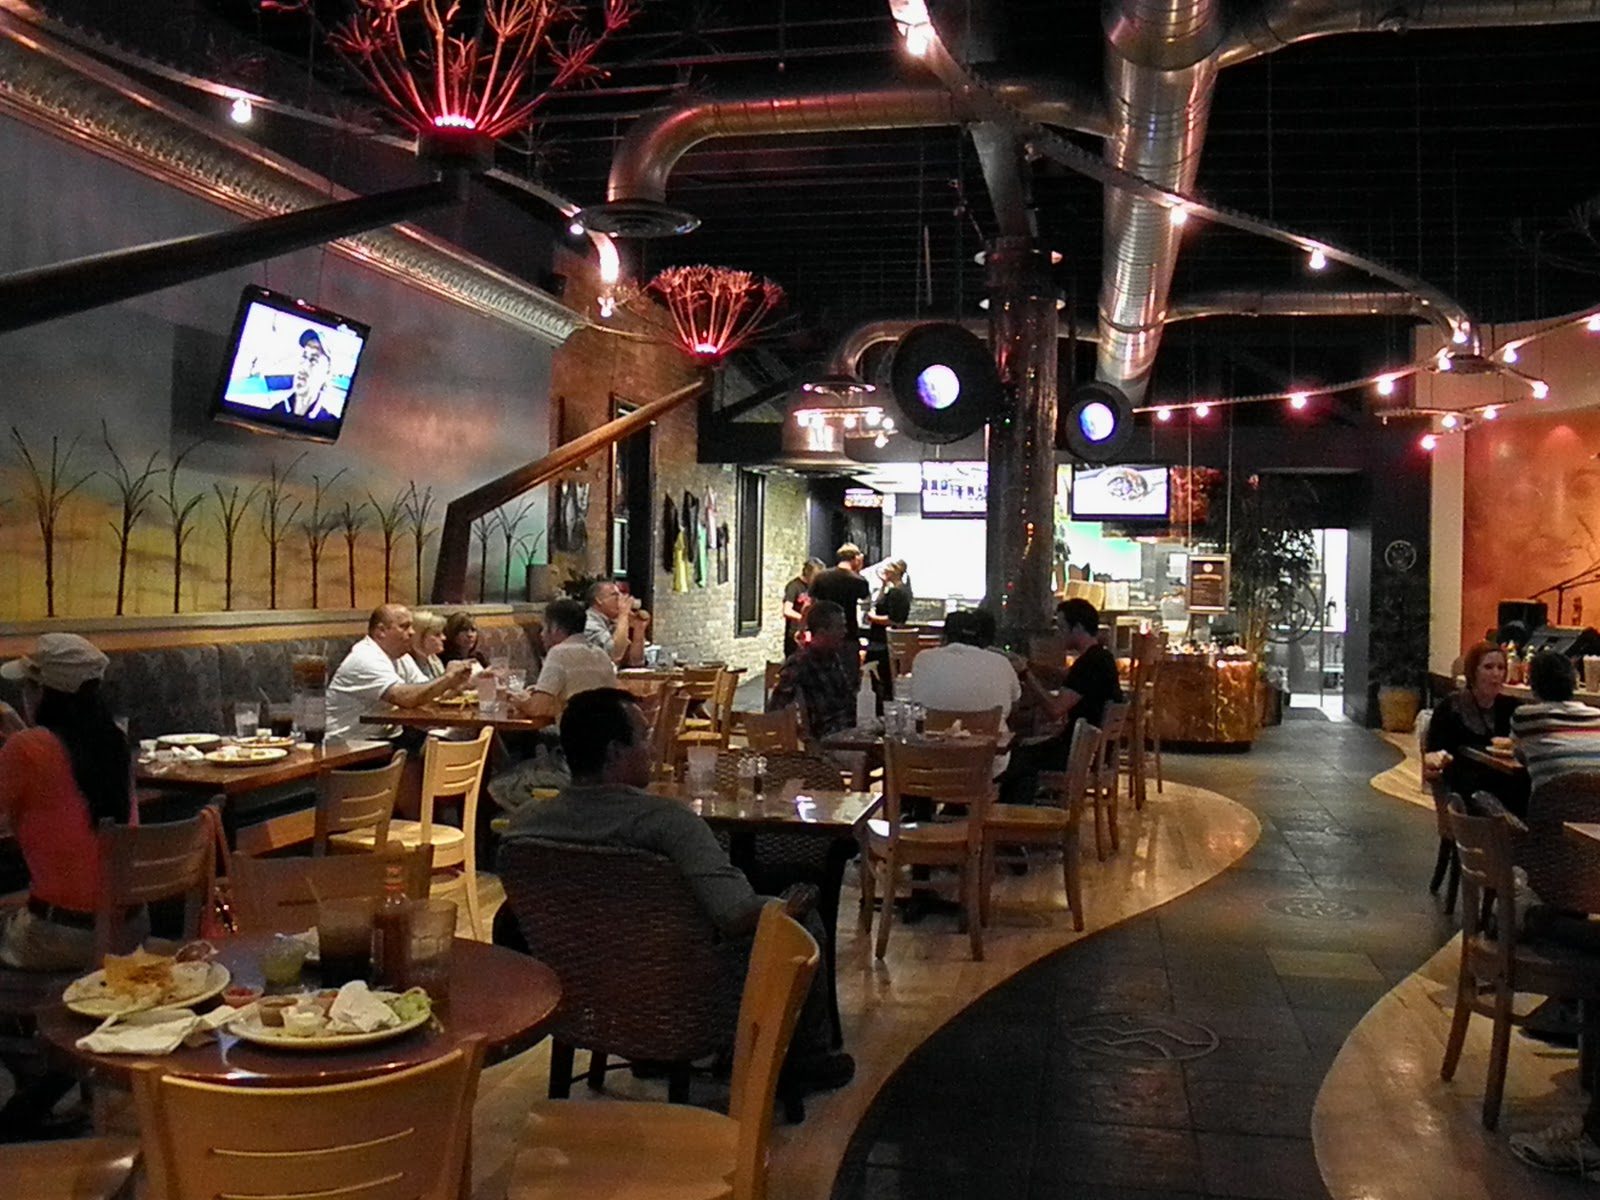 Marty S Flying Vegan Review Guru S Cafe Provo Utah